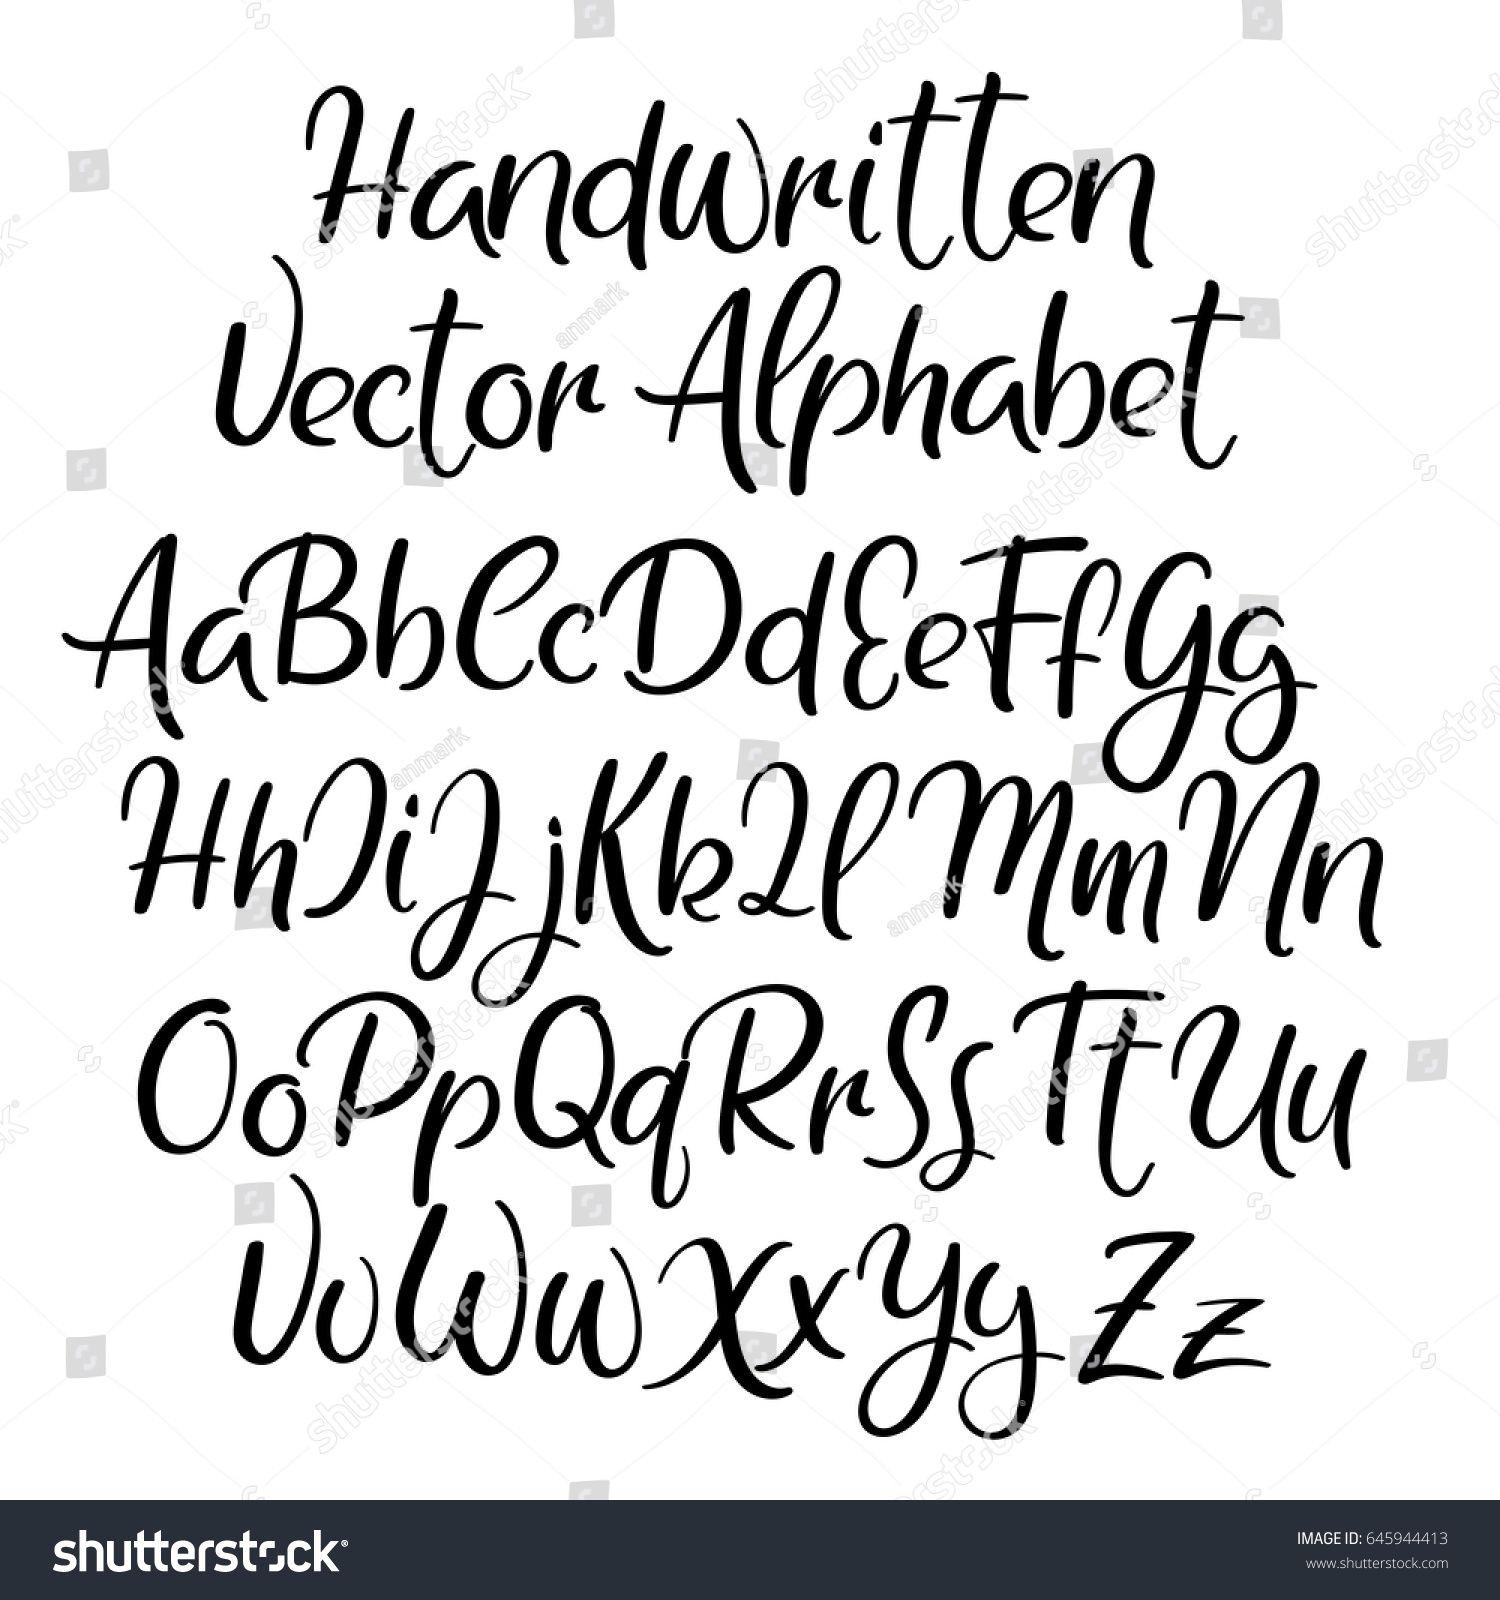 Modern Calligraphy Font Handwritten Brush Letters Uppercase Lowercase Hand Lettering Fonts Handwriting Alphabet Hand Lettering Alphabet Lettering Alphabet